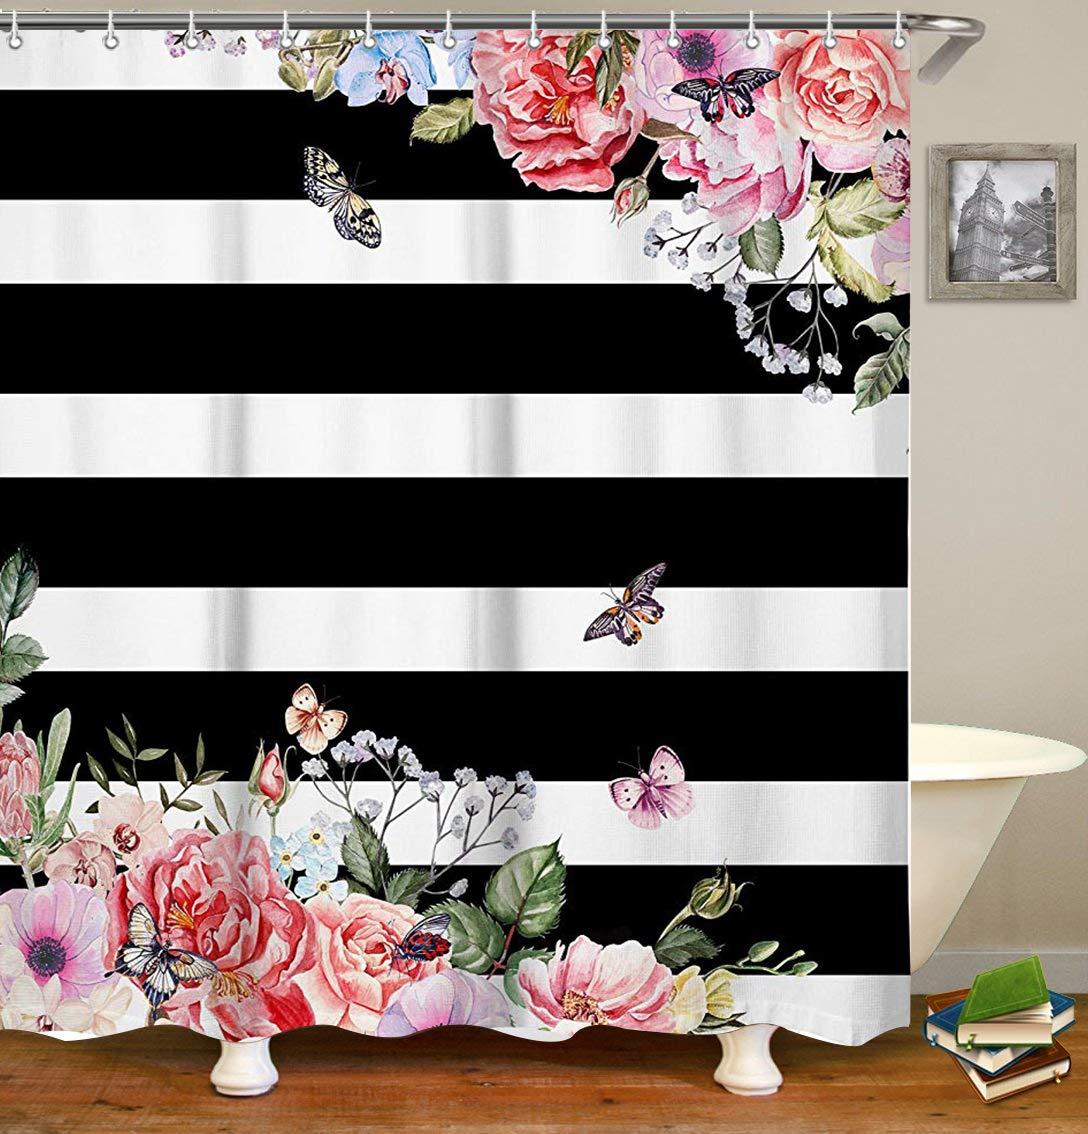 Livilan Waterproof Fabric Shower Curtain Set 70.8'' x 70.8'' Pink Flowers & Black White Stripes Pattern Decorative Thick Bathroom Curtain